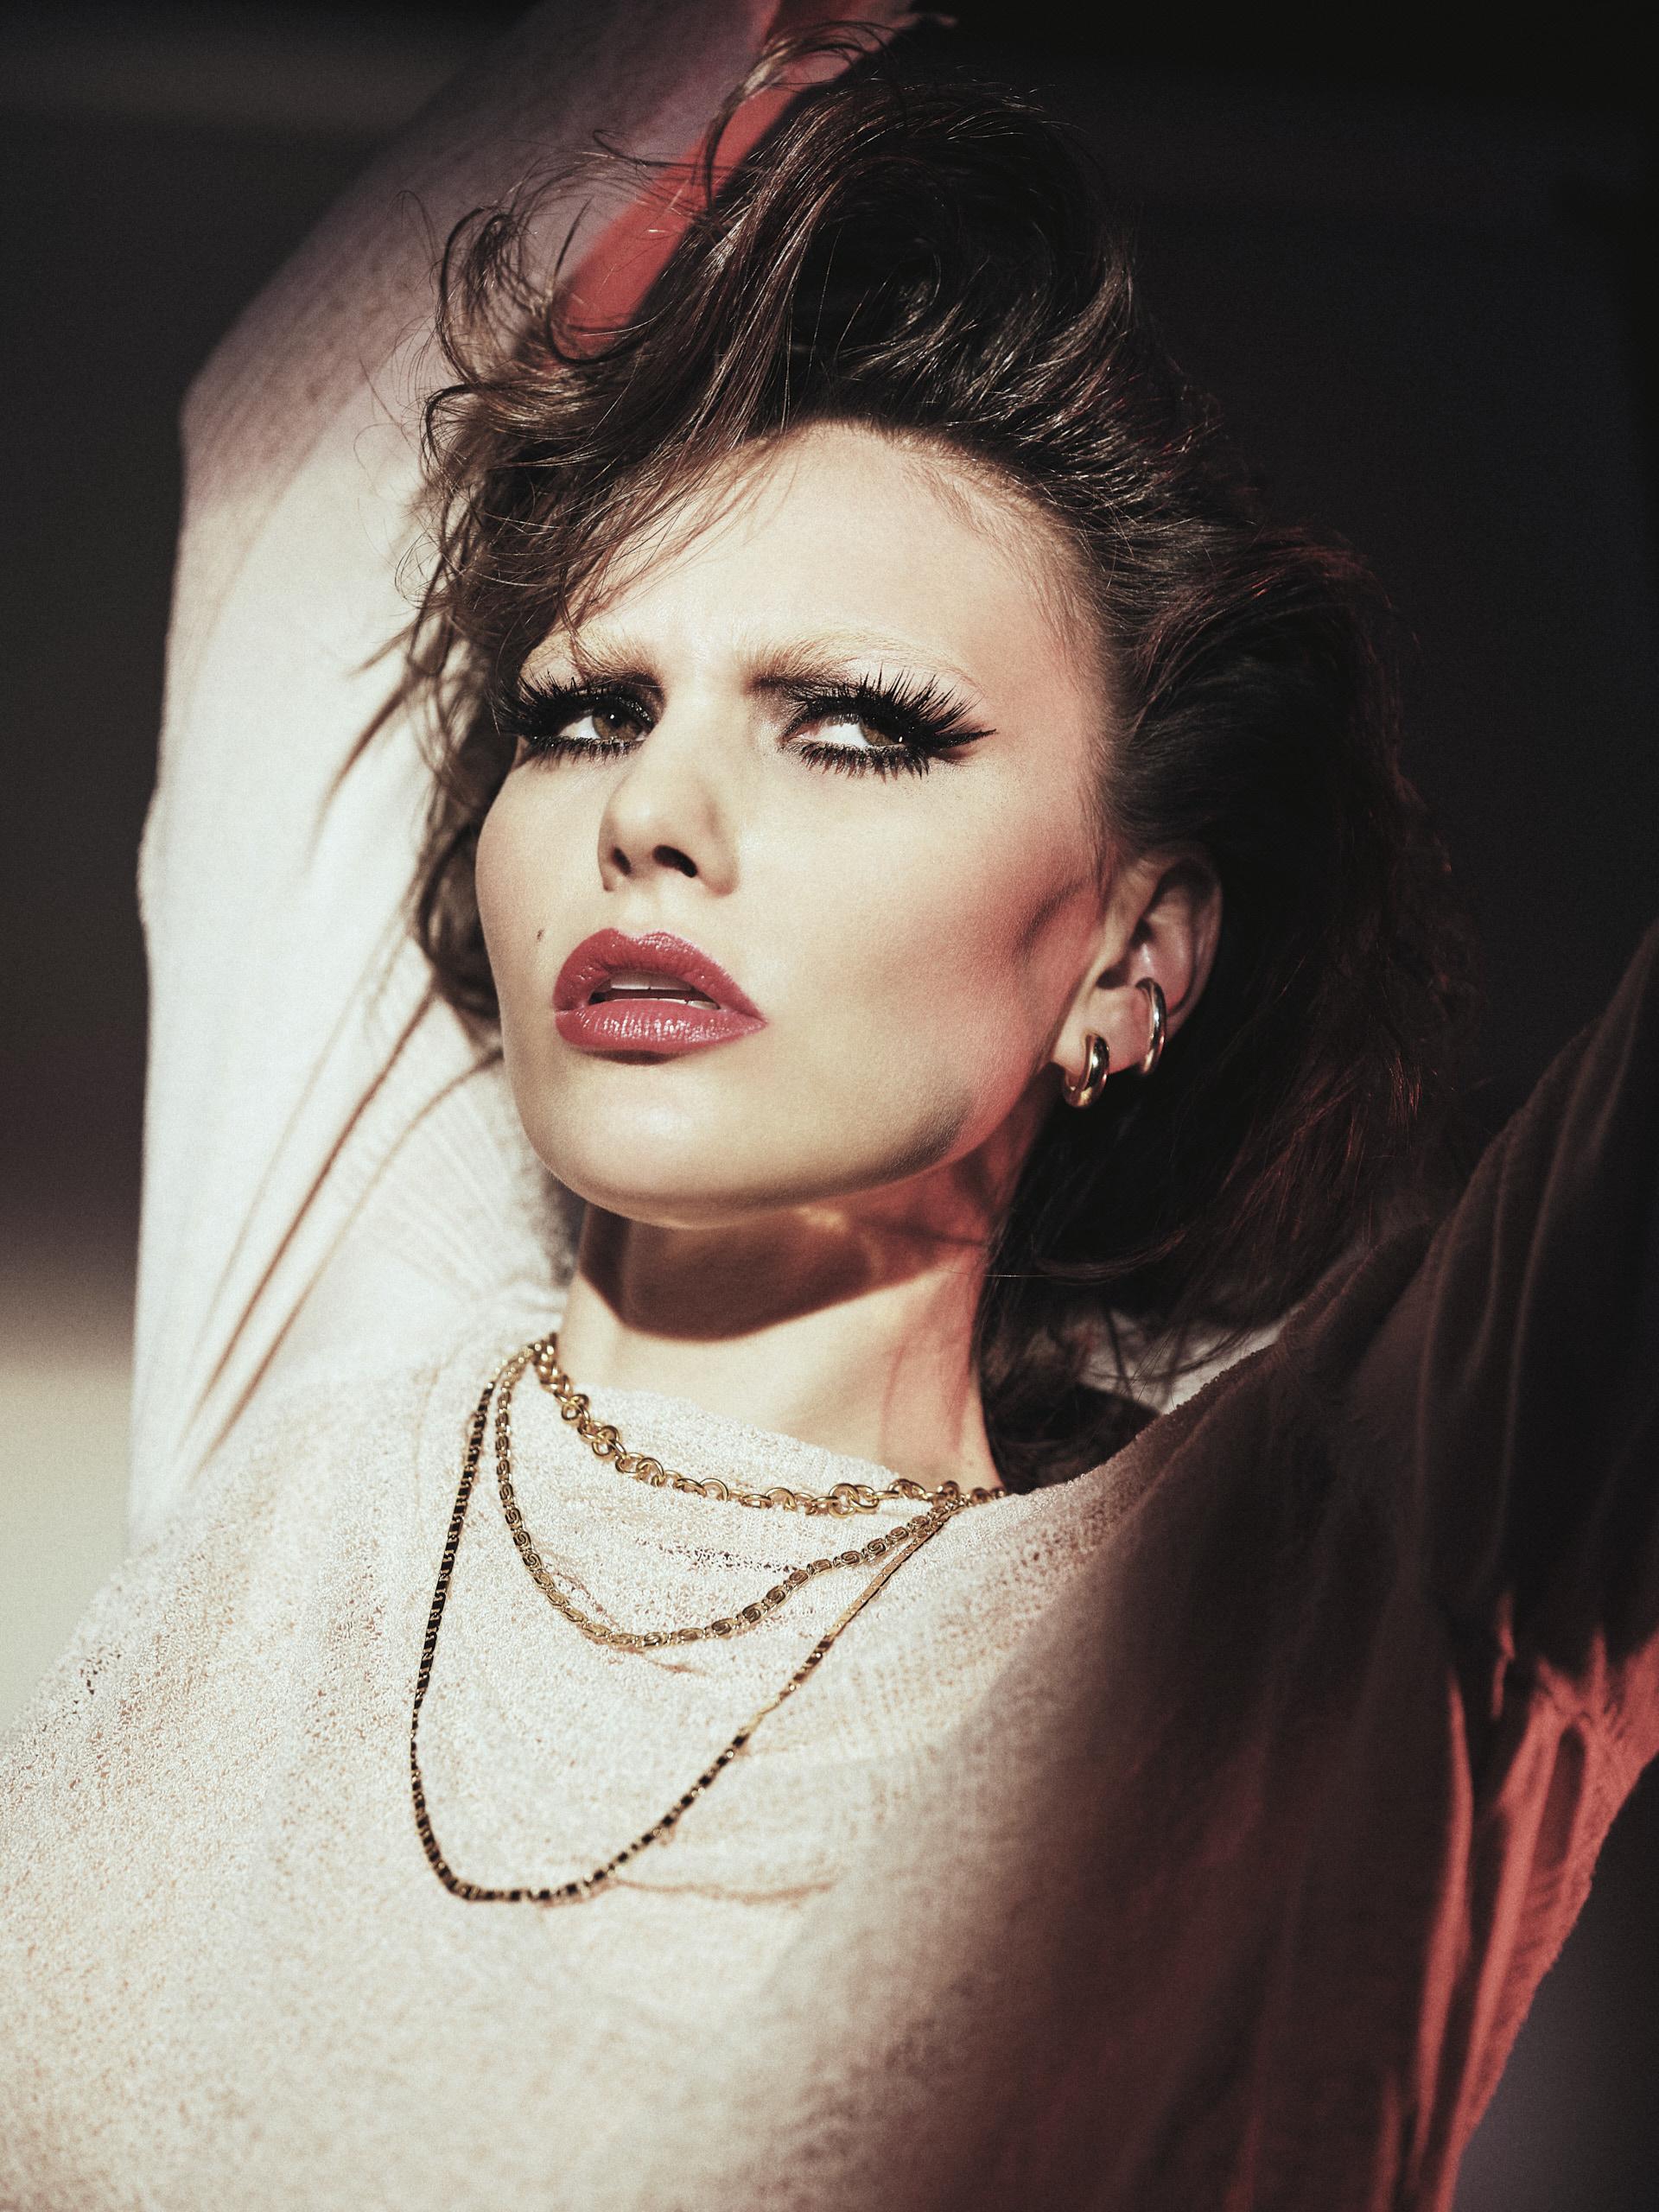 Fashion Editorial: Decades Of Decadence – ethical vegan fashion editorial by Brix & Maas for Antagonist